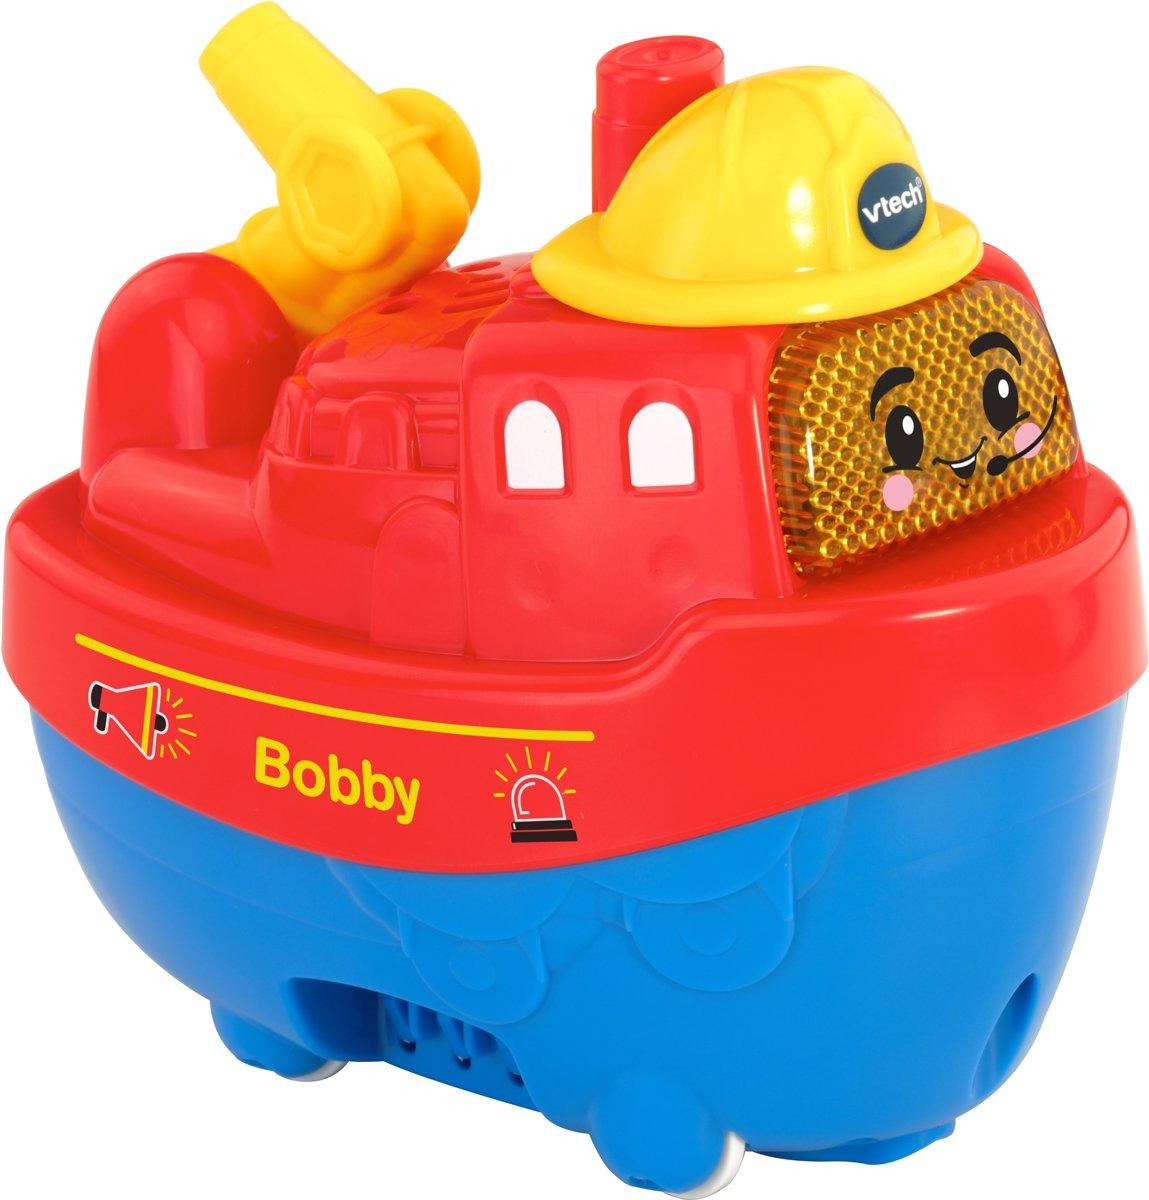 BBB - Bobby Brandweerboot